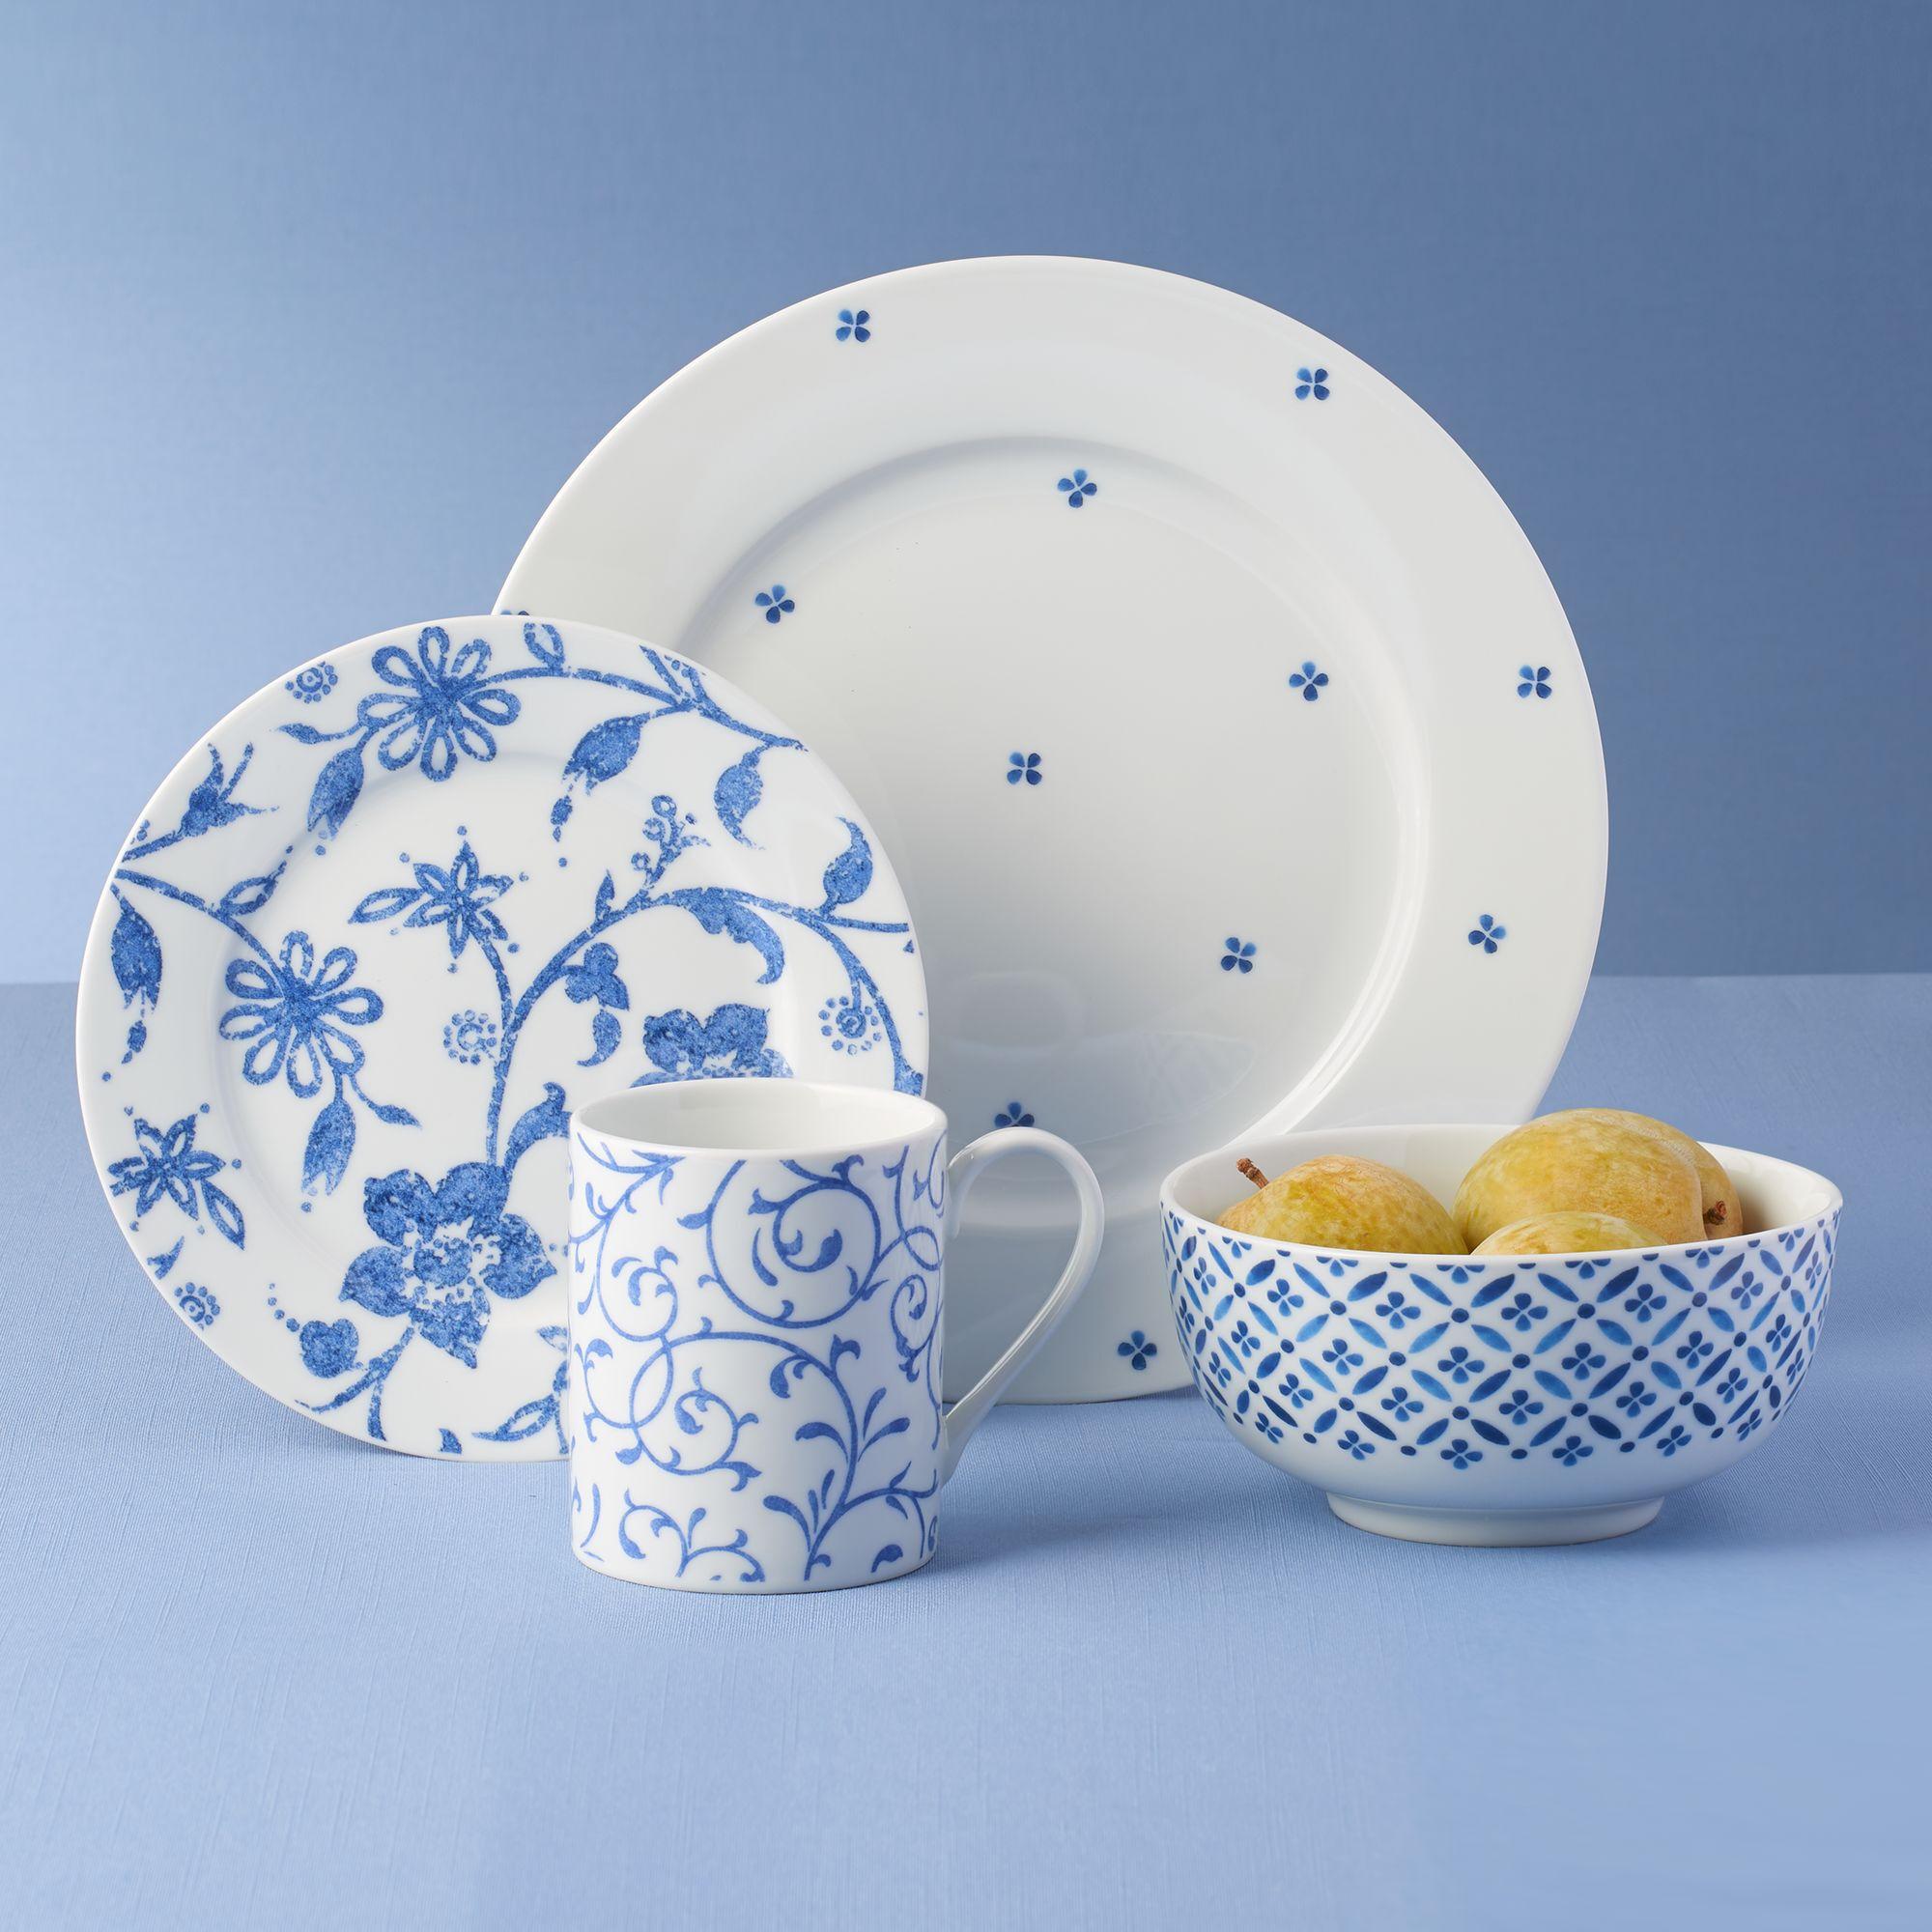 Spode u0026quot;Blue Indigou0026quot; Porcelain Dinnerware  default  sc 1 st  Ross-Simons & Spode